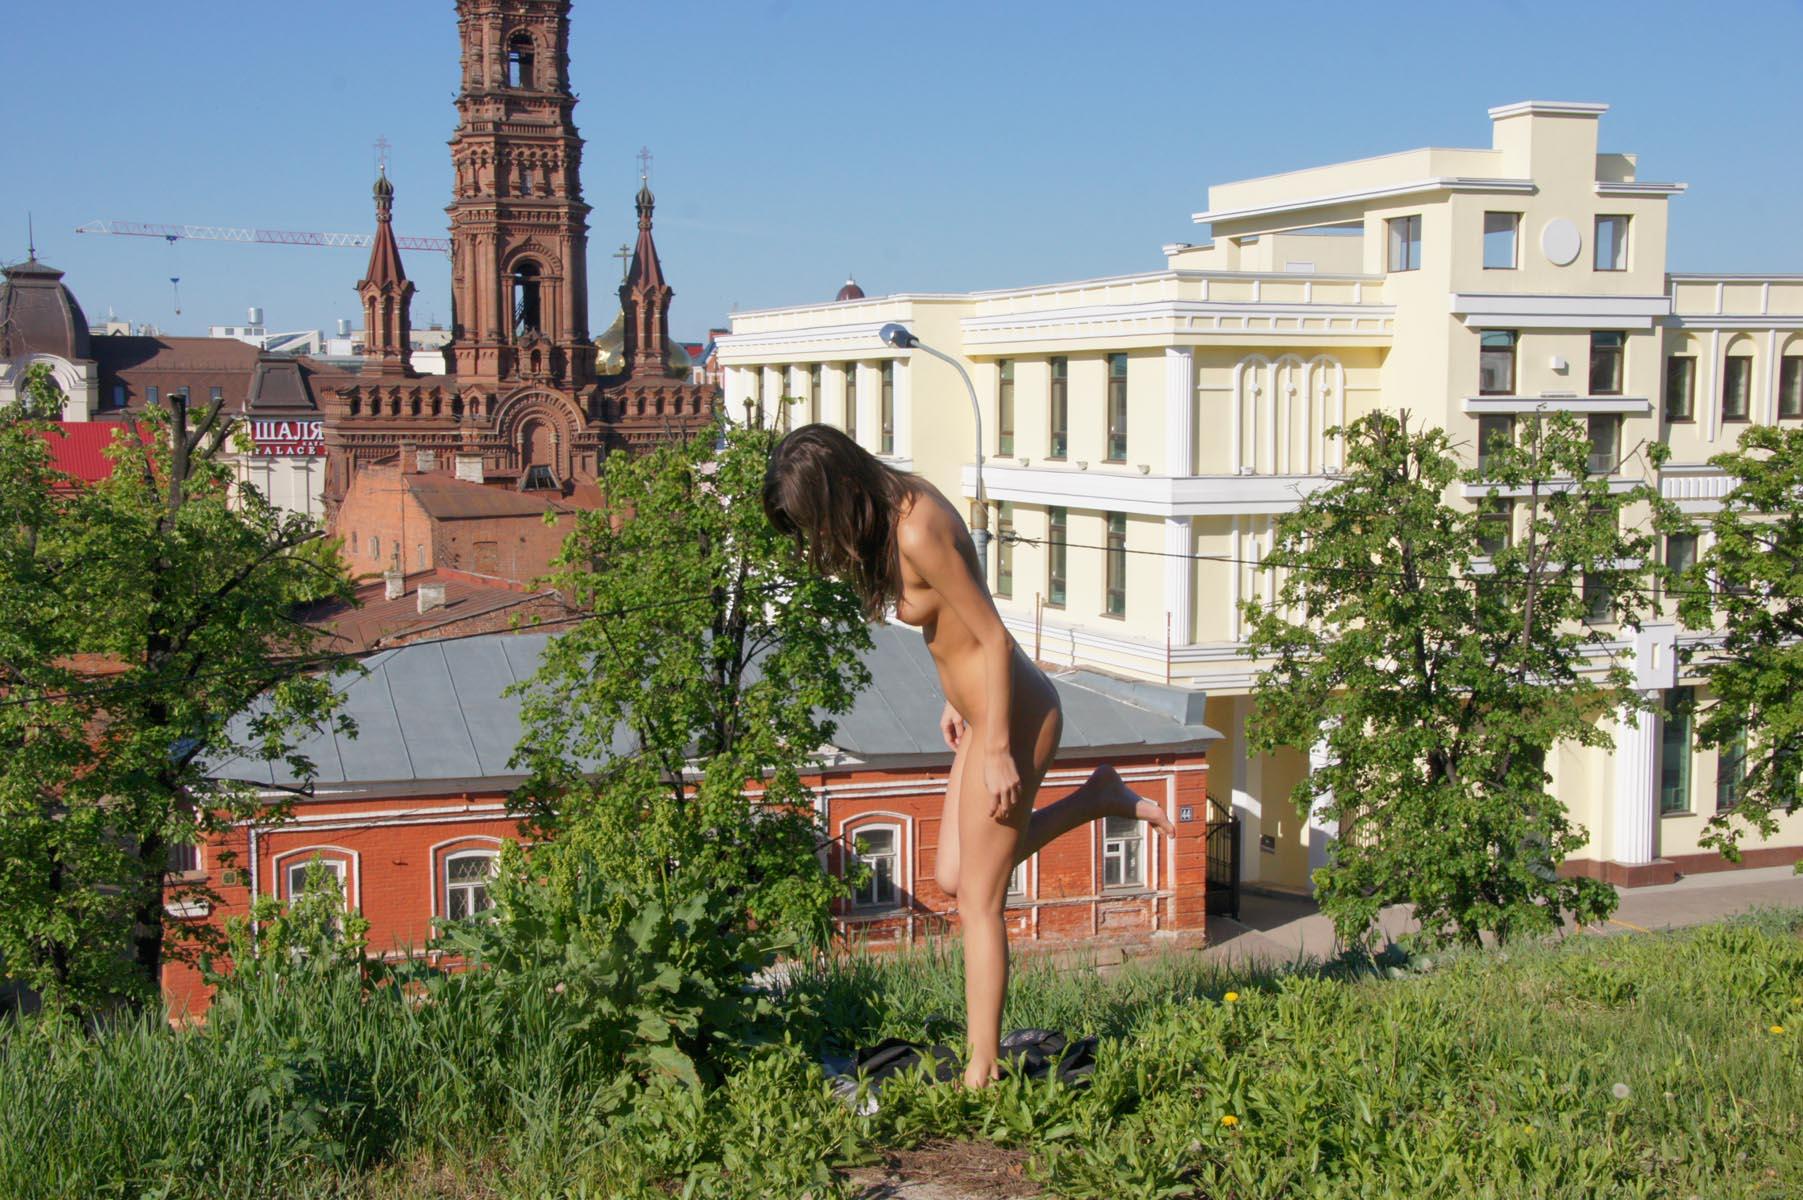 irina-k-naked-in-russia-kazan-nude-public-17